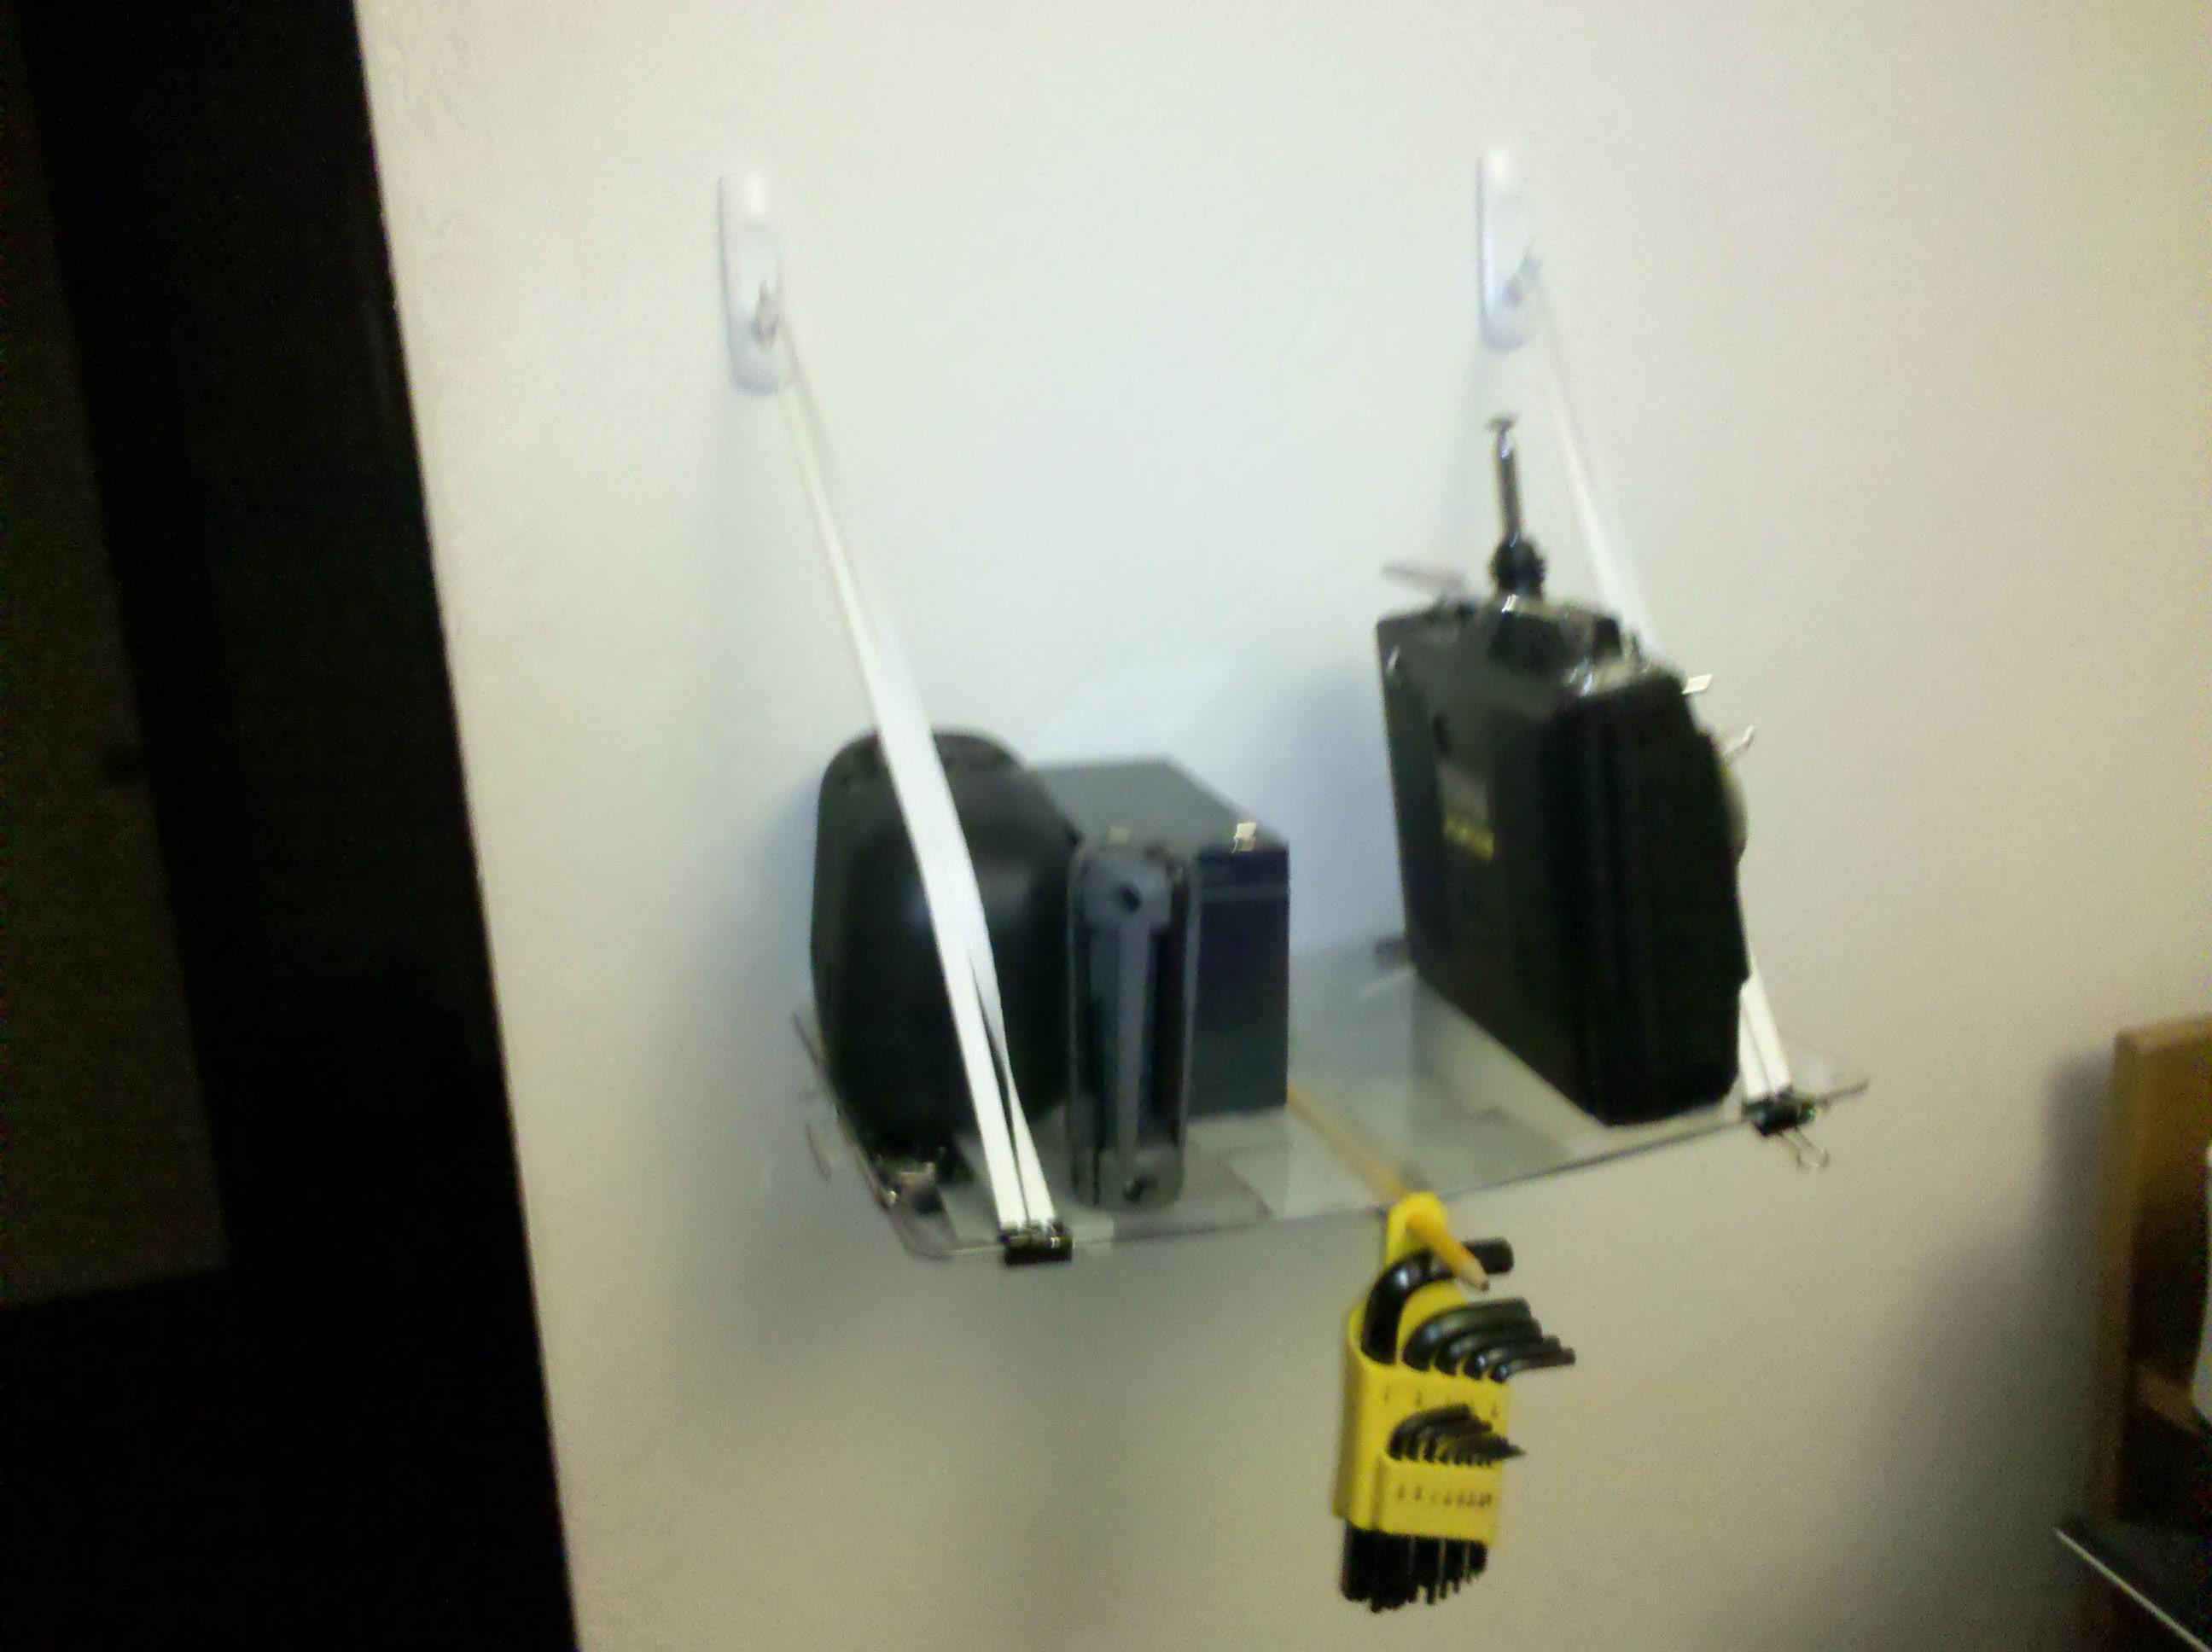 Screw-free, damage free, tool free shelf